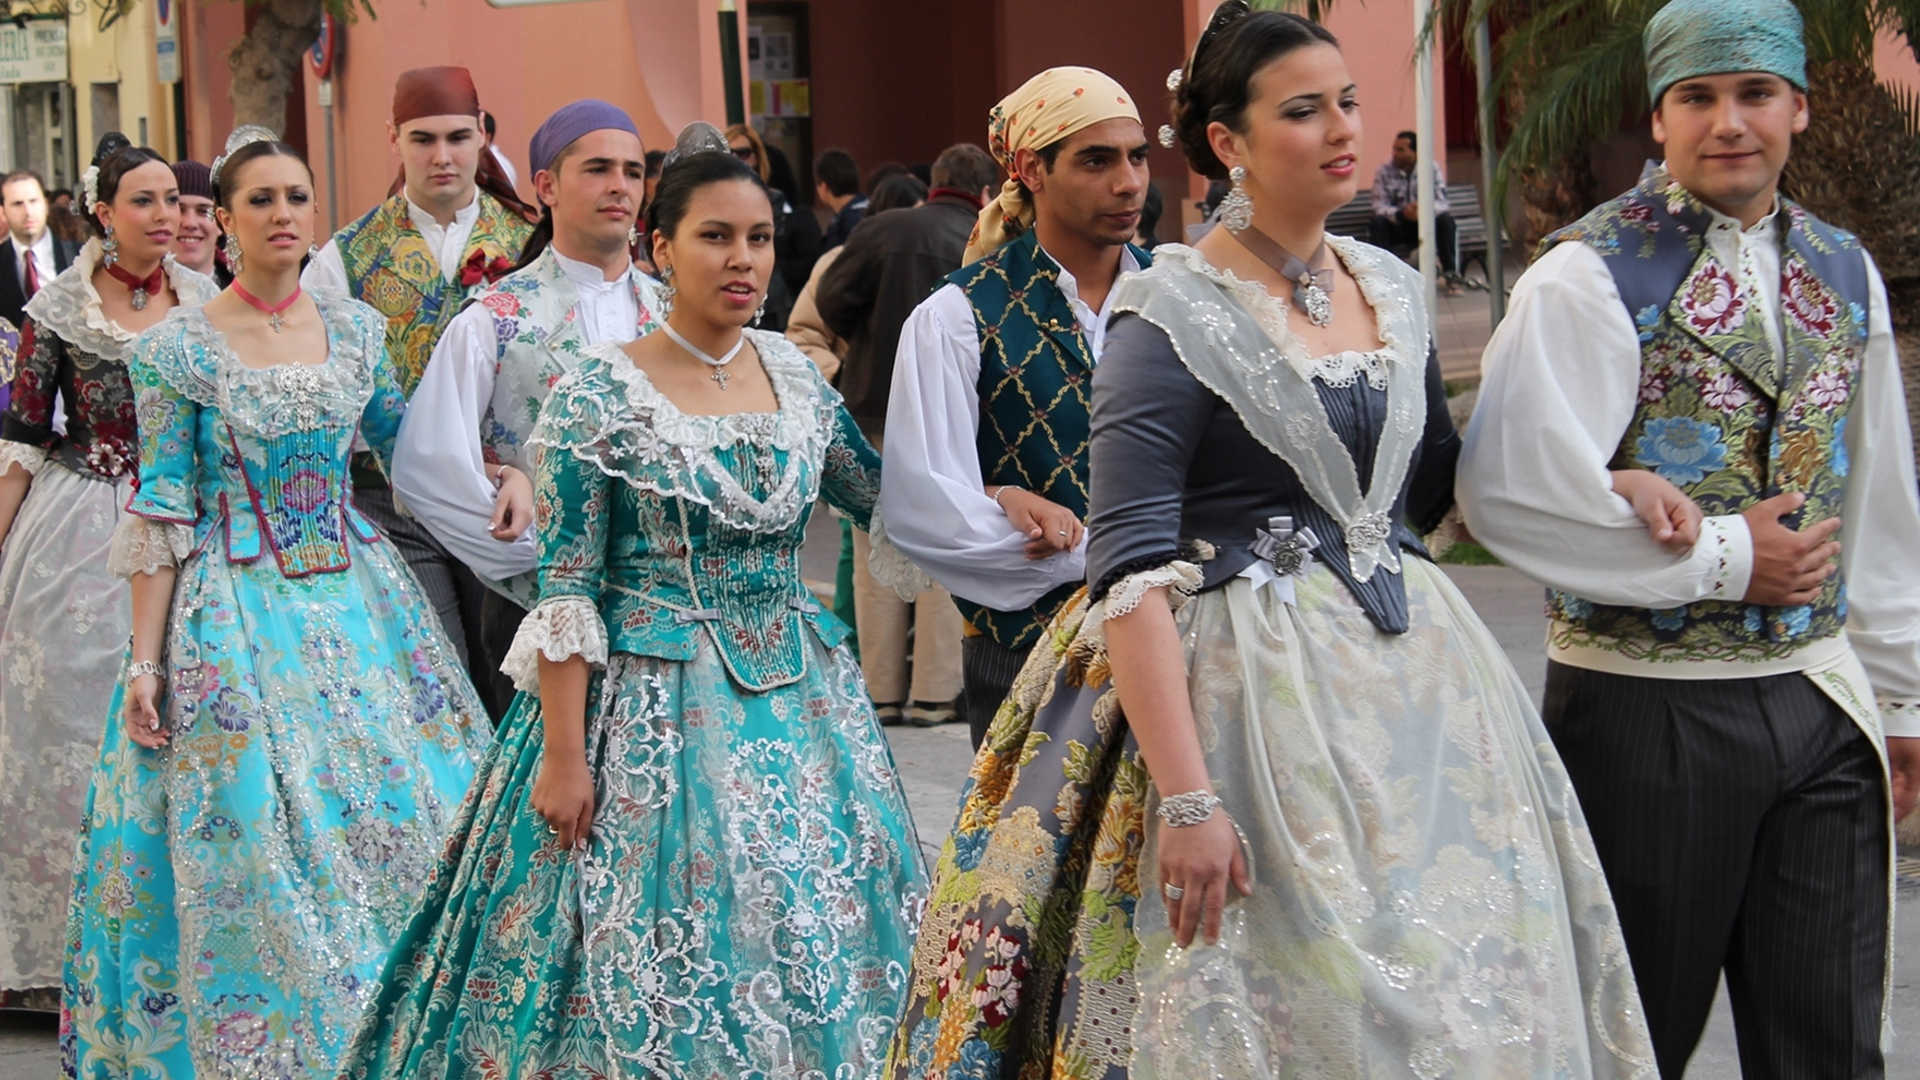 Festividad de San Vicente Ferrer